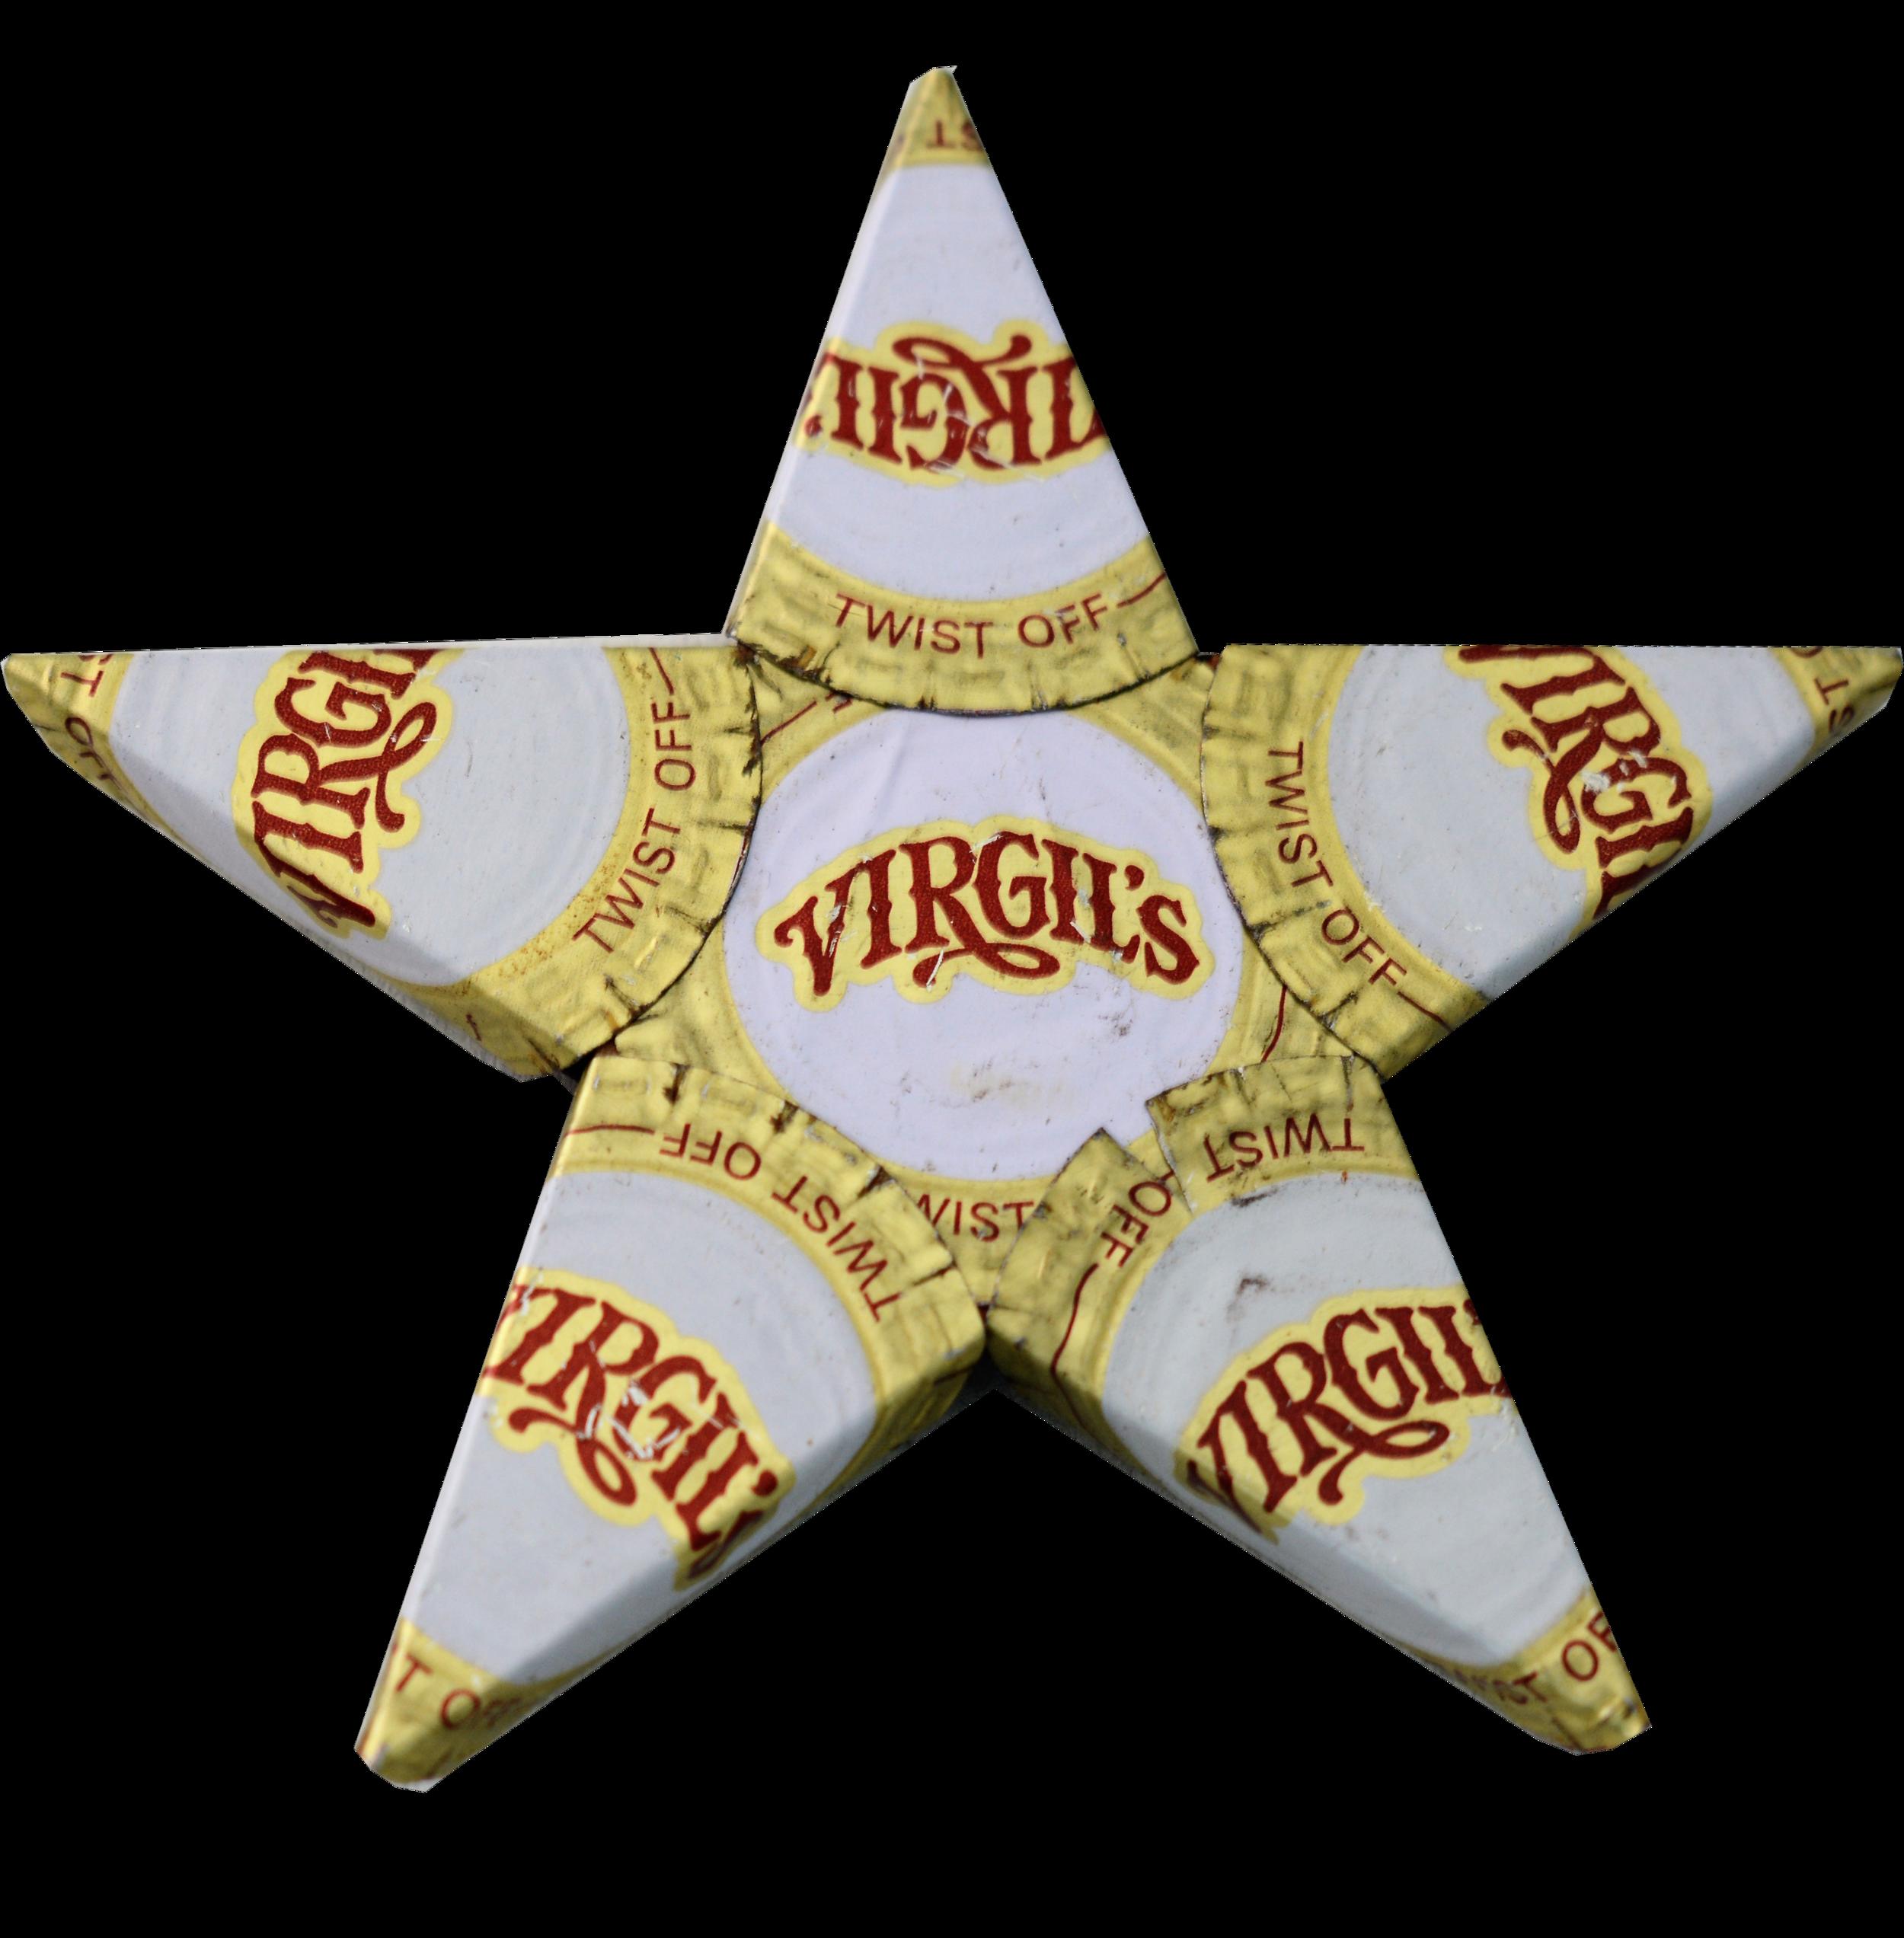 Virgils